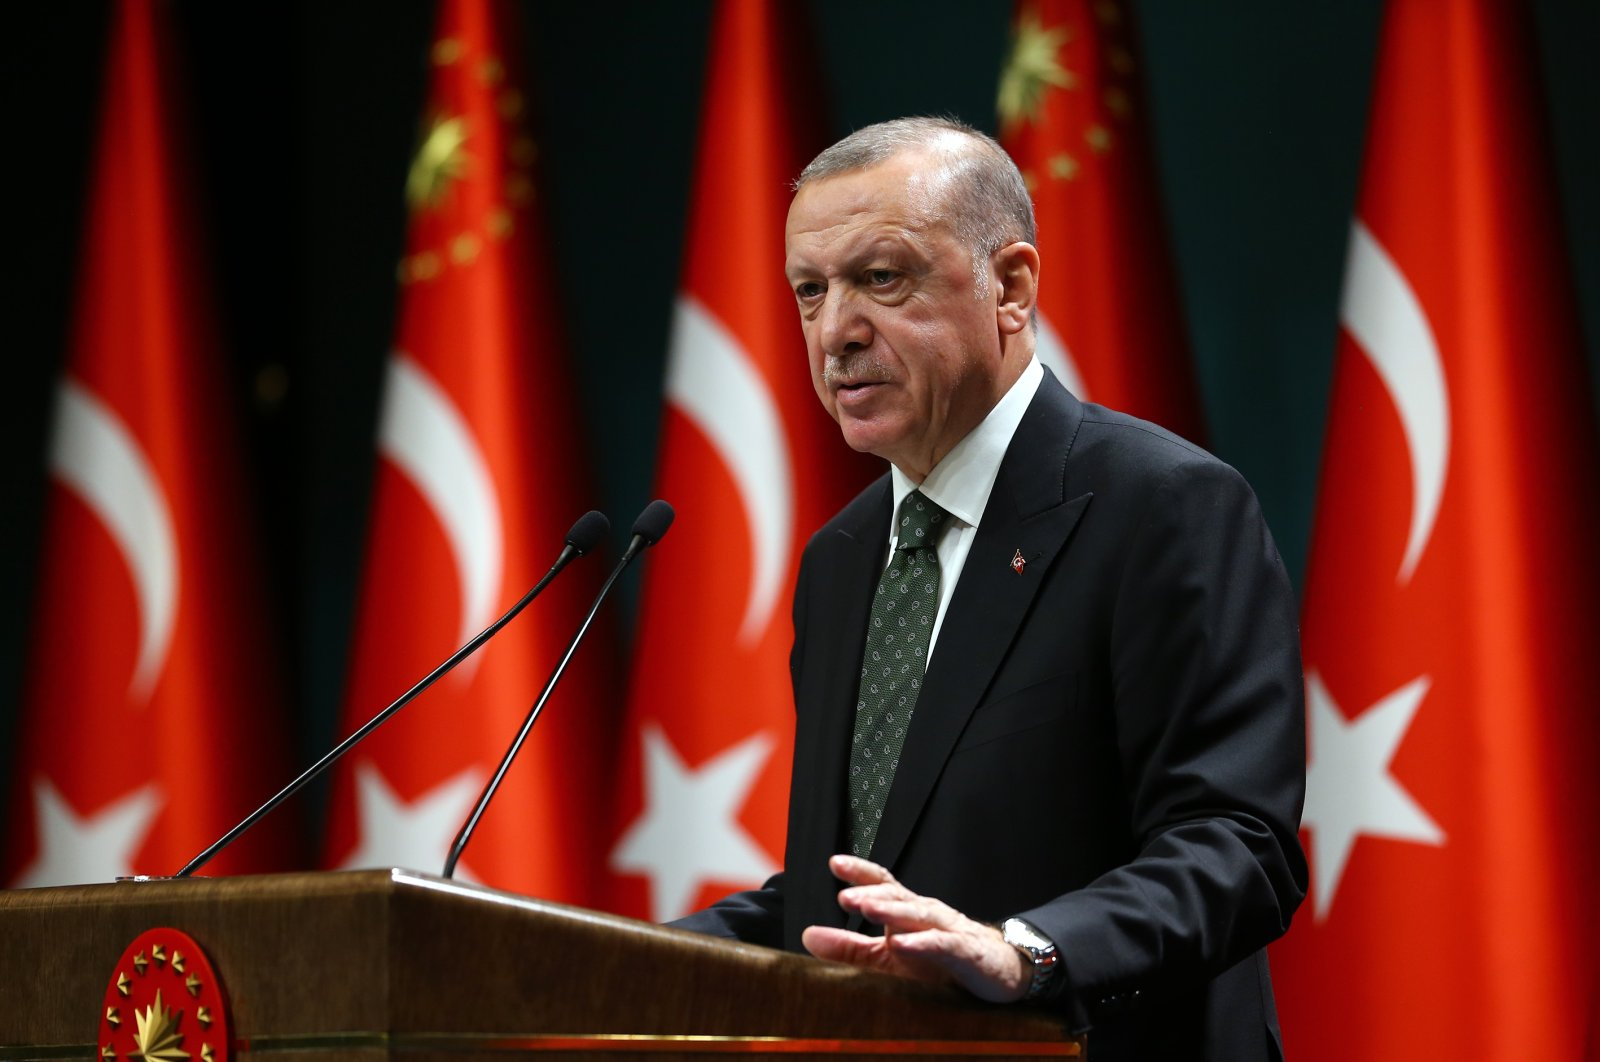 President Recep Tayyip Erdoğan speaks following a Cabinet meeting in Ankara, Turkey, Nov. 17, 2020. (AA Photo)